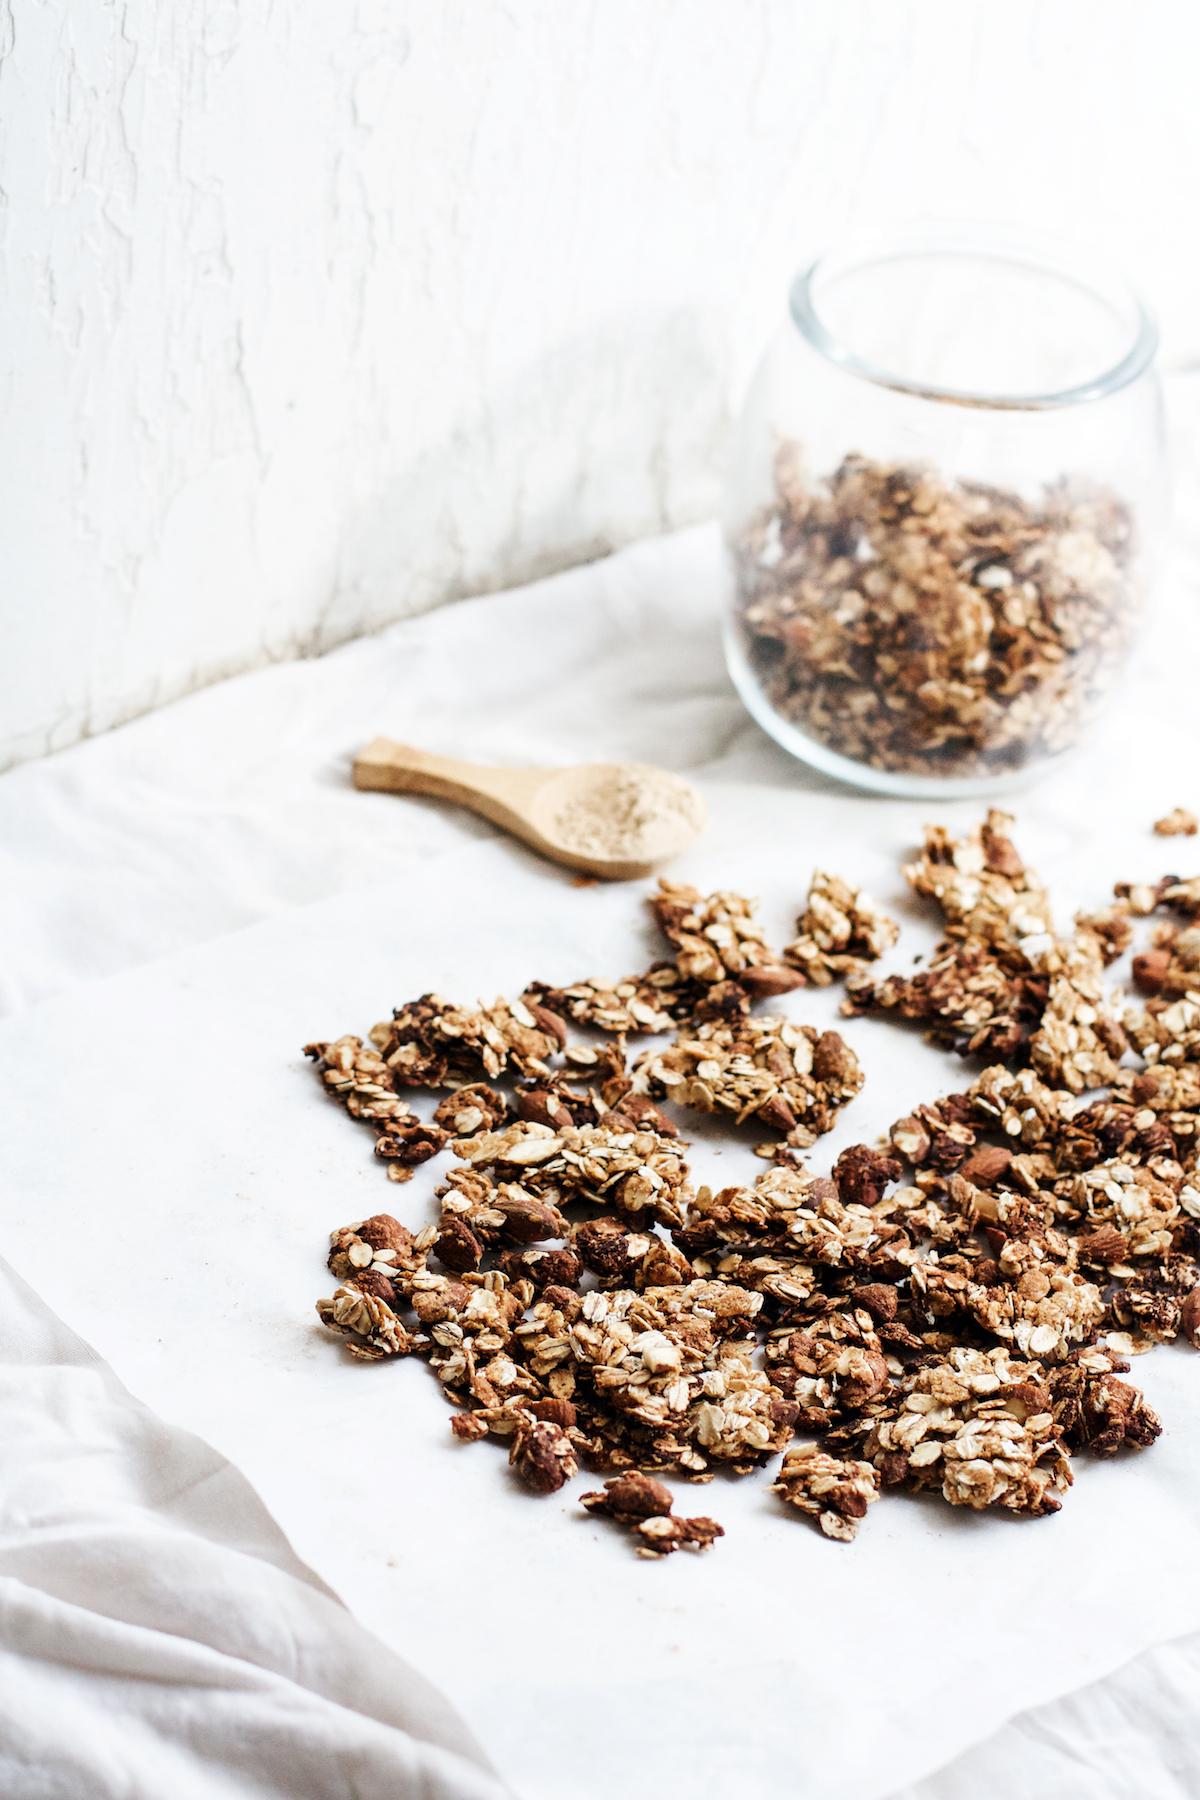 Almond, Maca, + Chickpea Flour Granola {gluten-free + vegan options} | Ruby Josephine